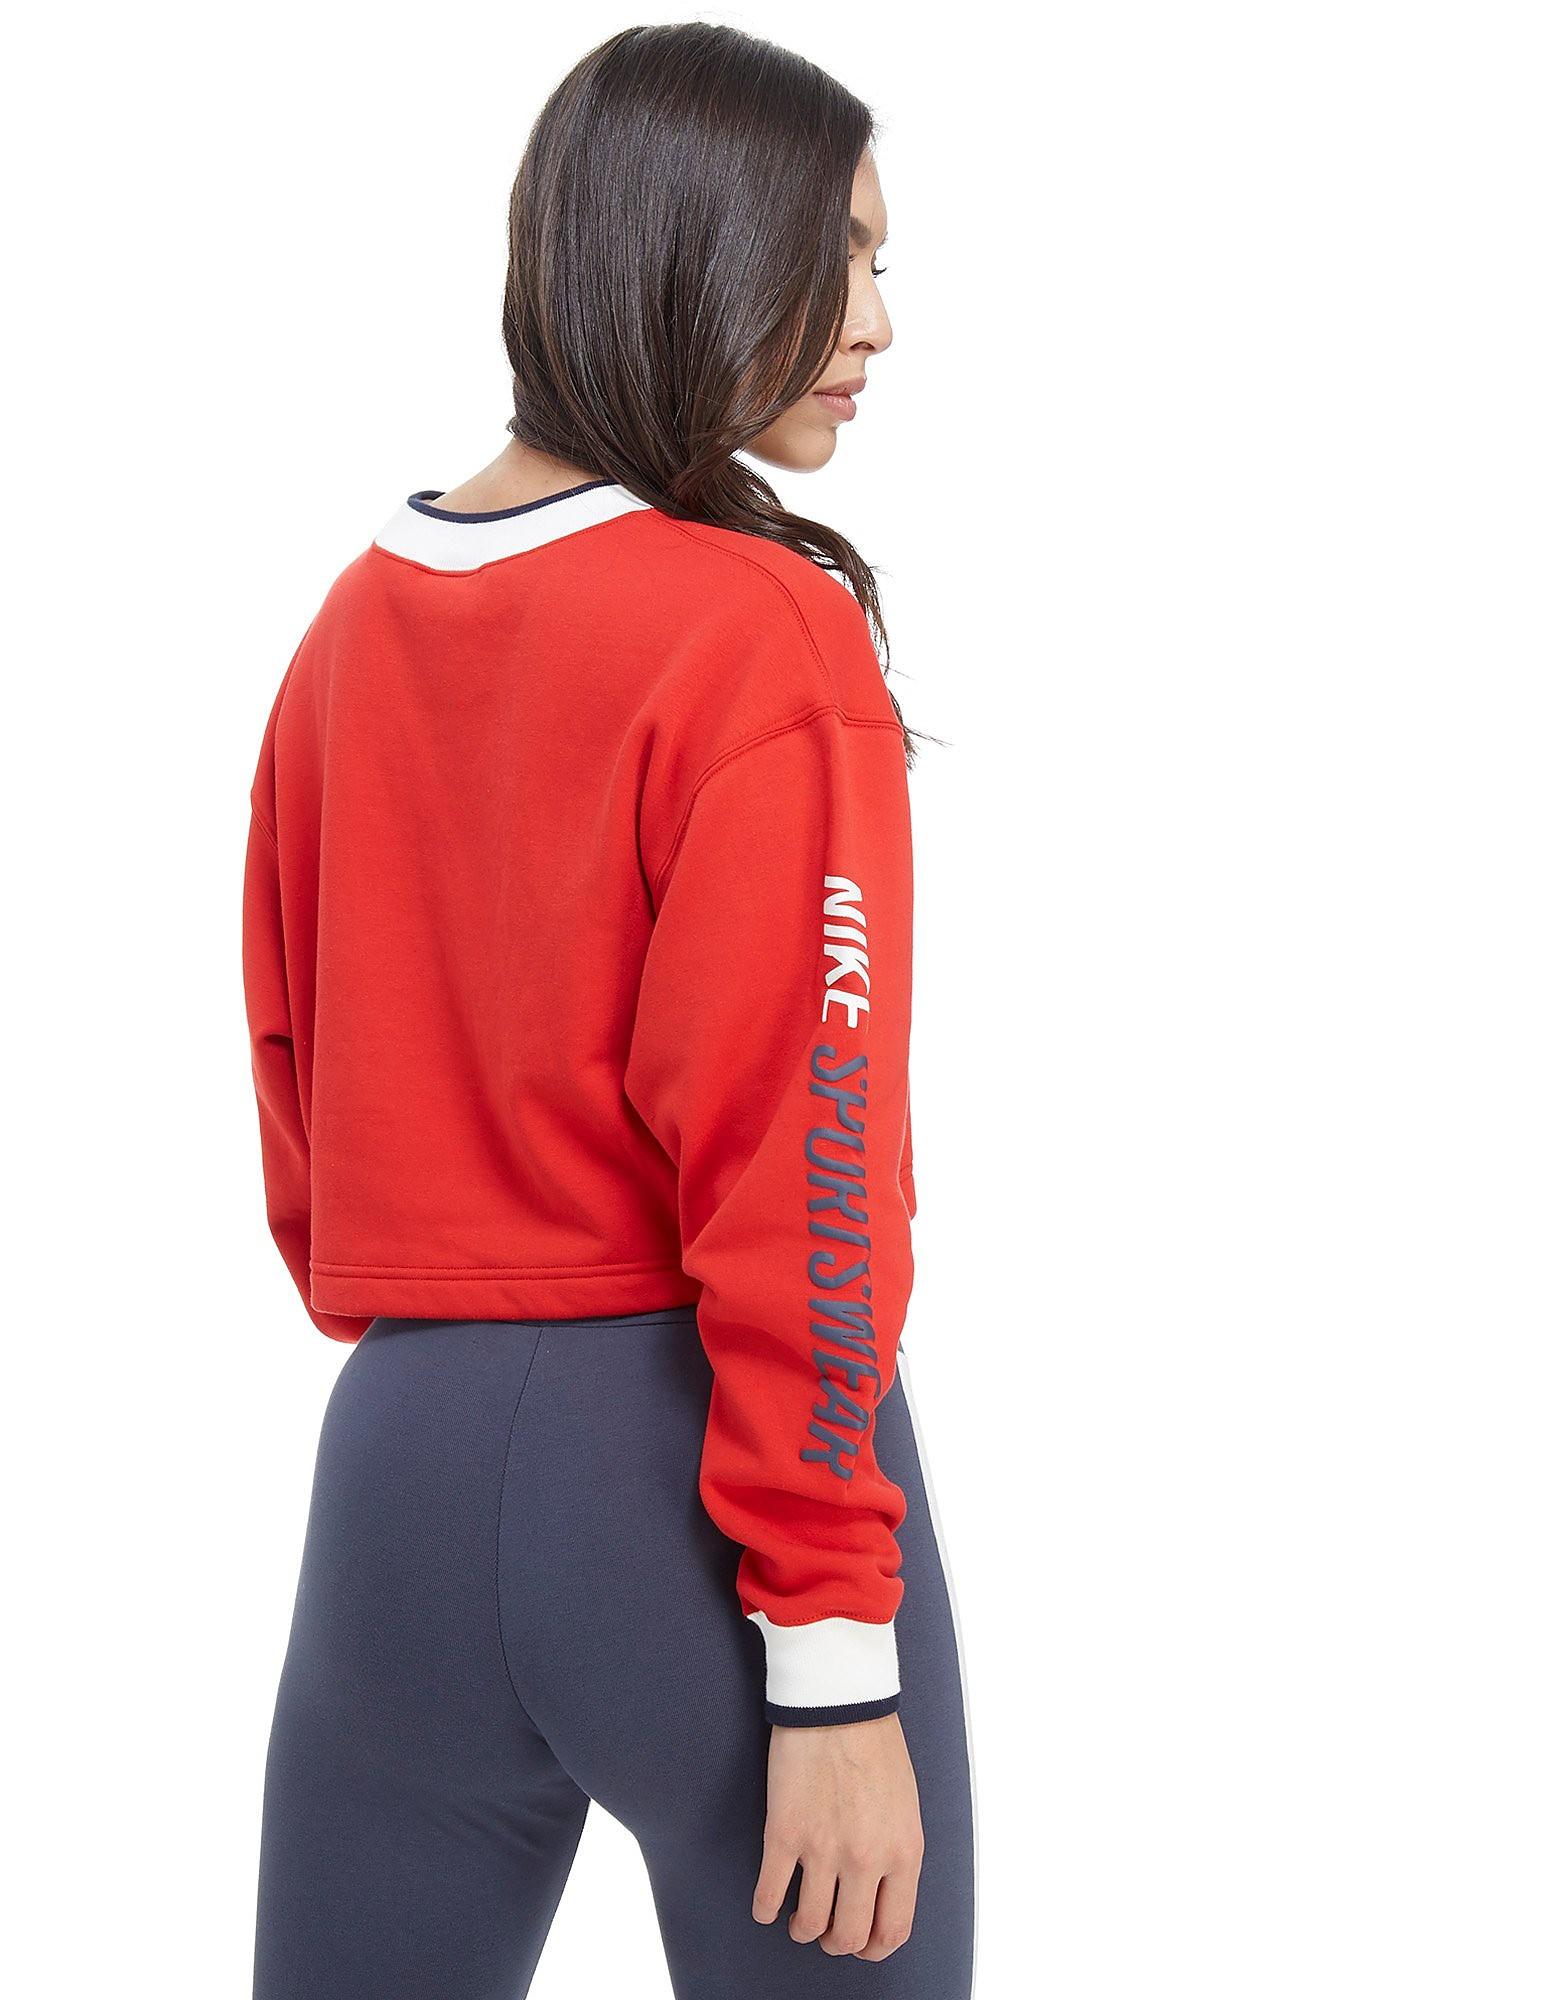 Nike Archive Reversible Crew Sweatshirt